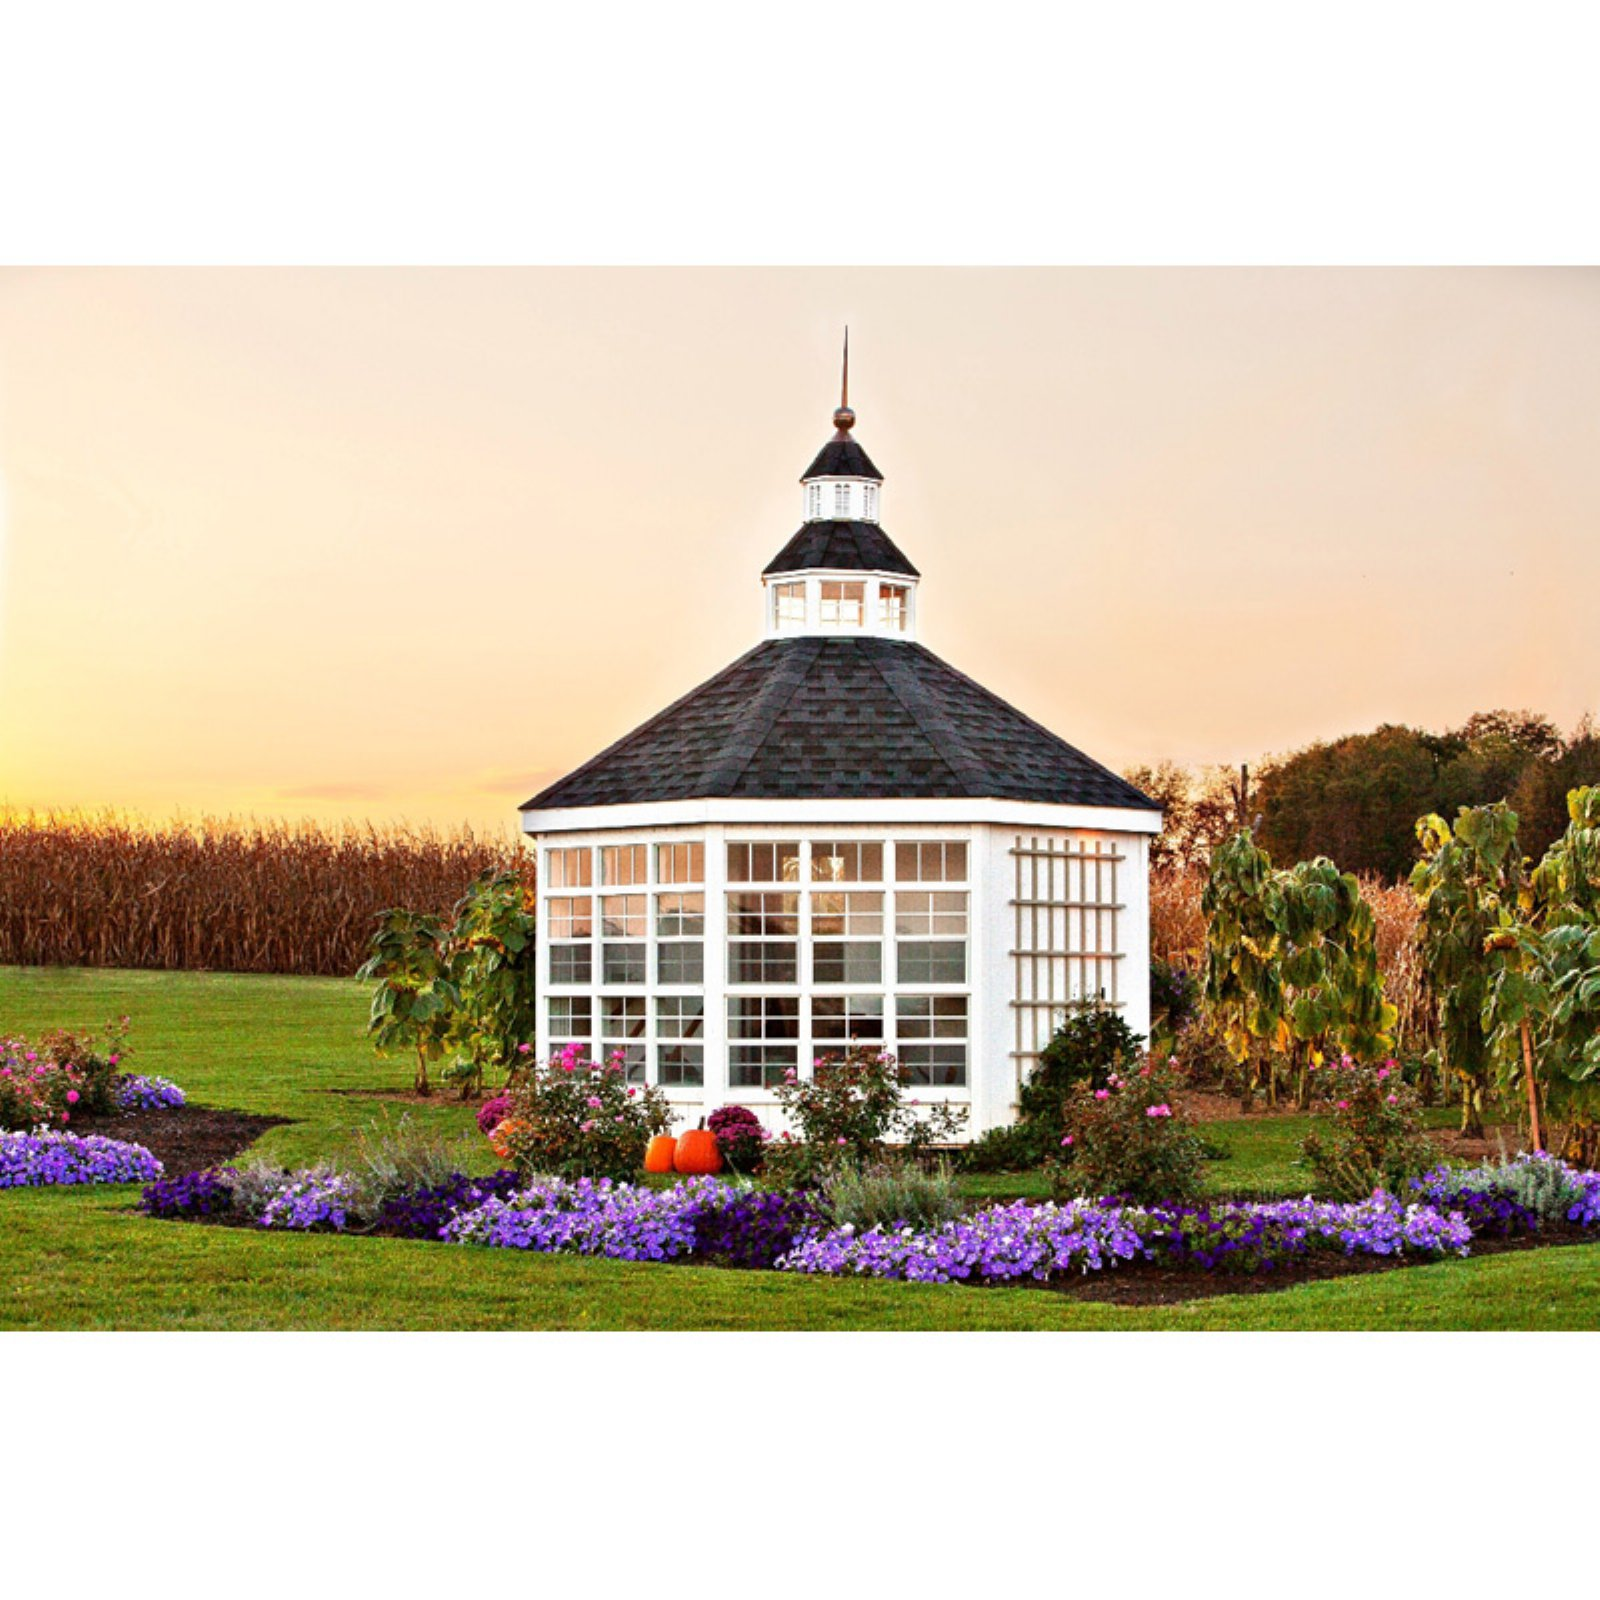 Little Cottage 12 ft. Panelized Garden Shed Greenhouse Kit